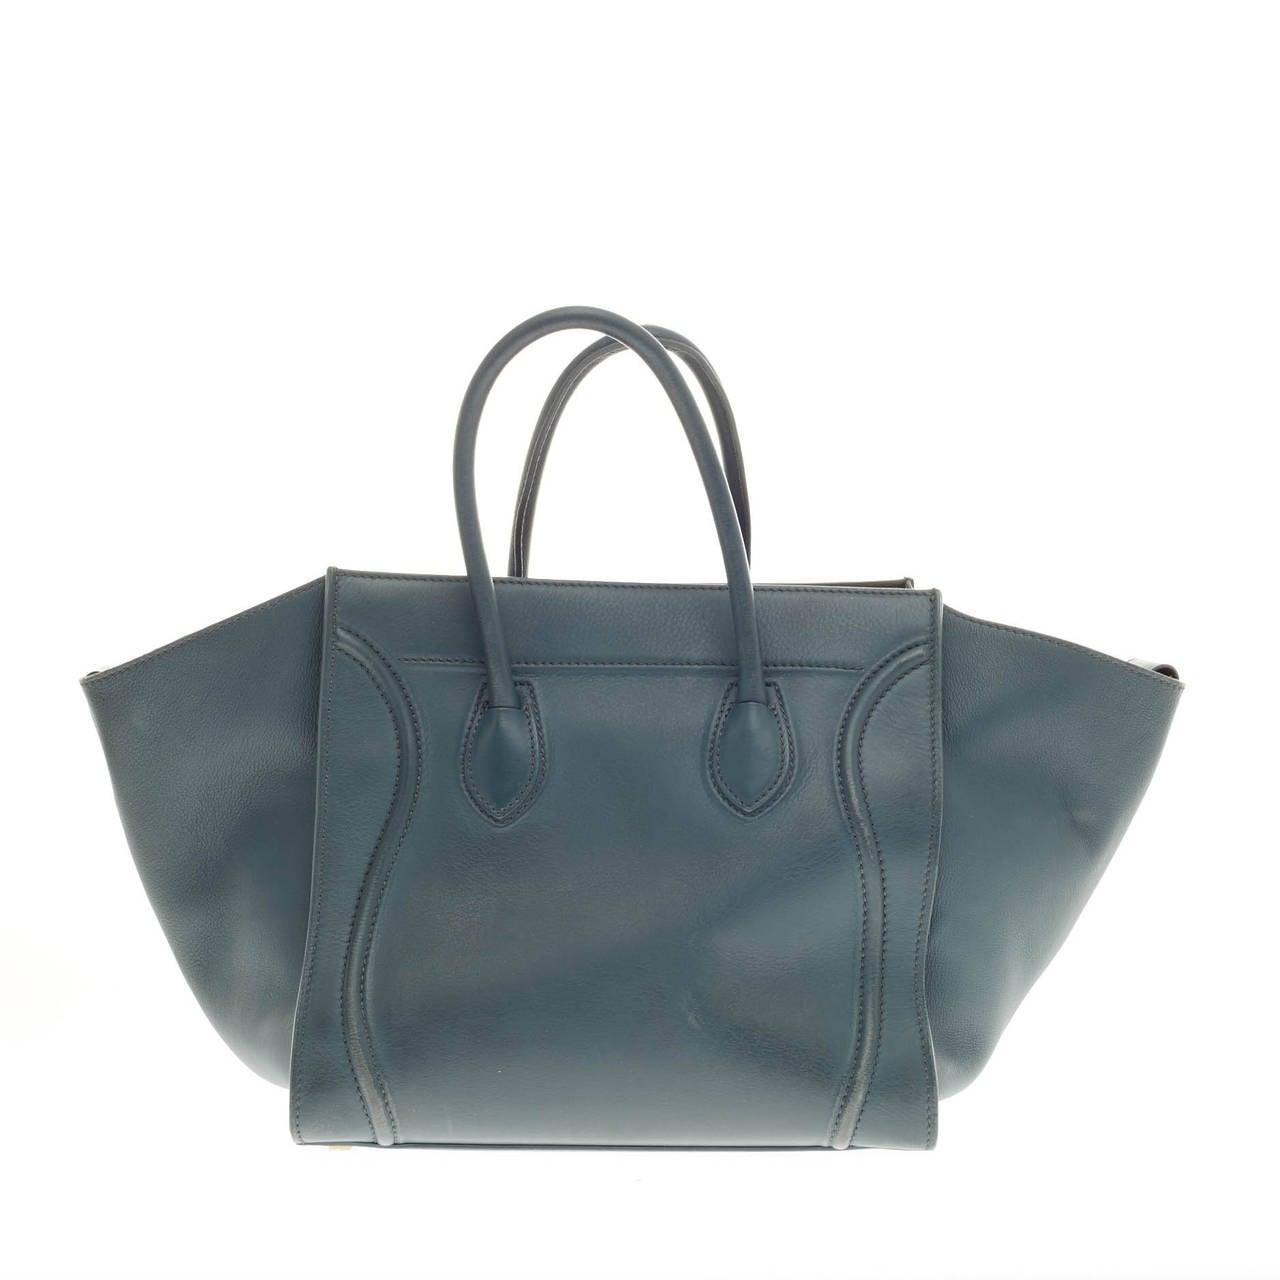 Celine Phantom Smooth Leather Large 4